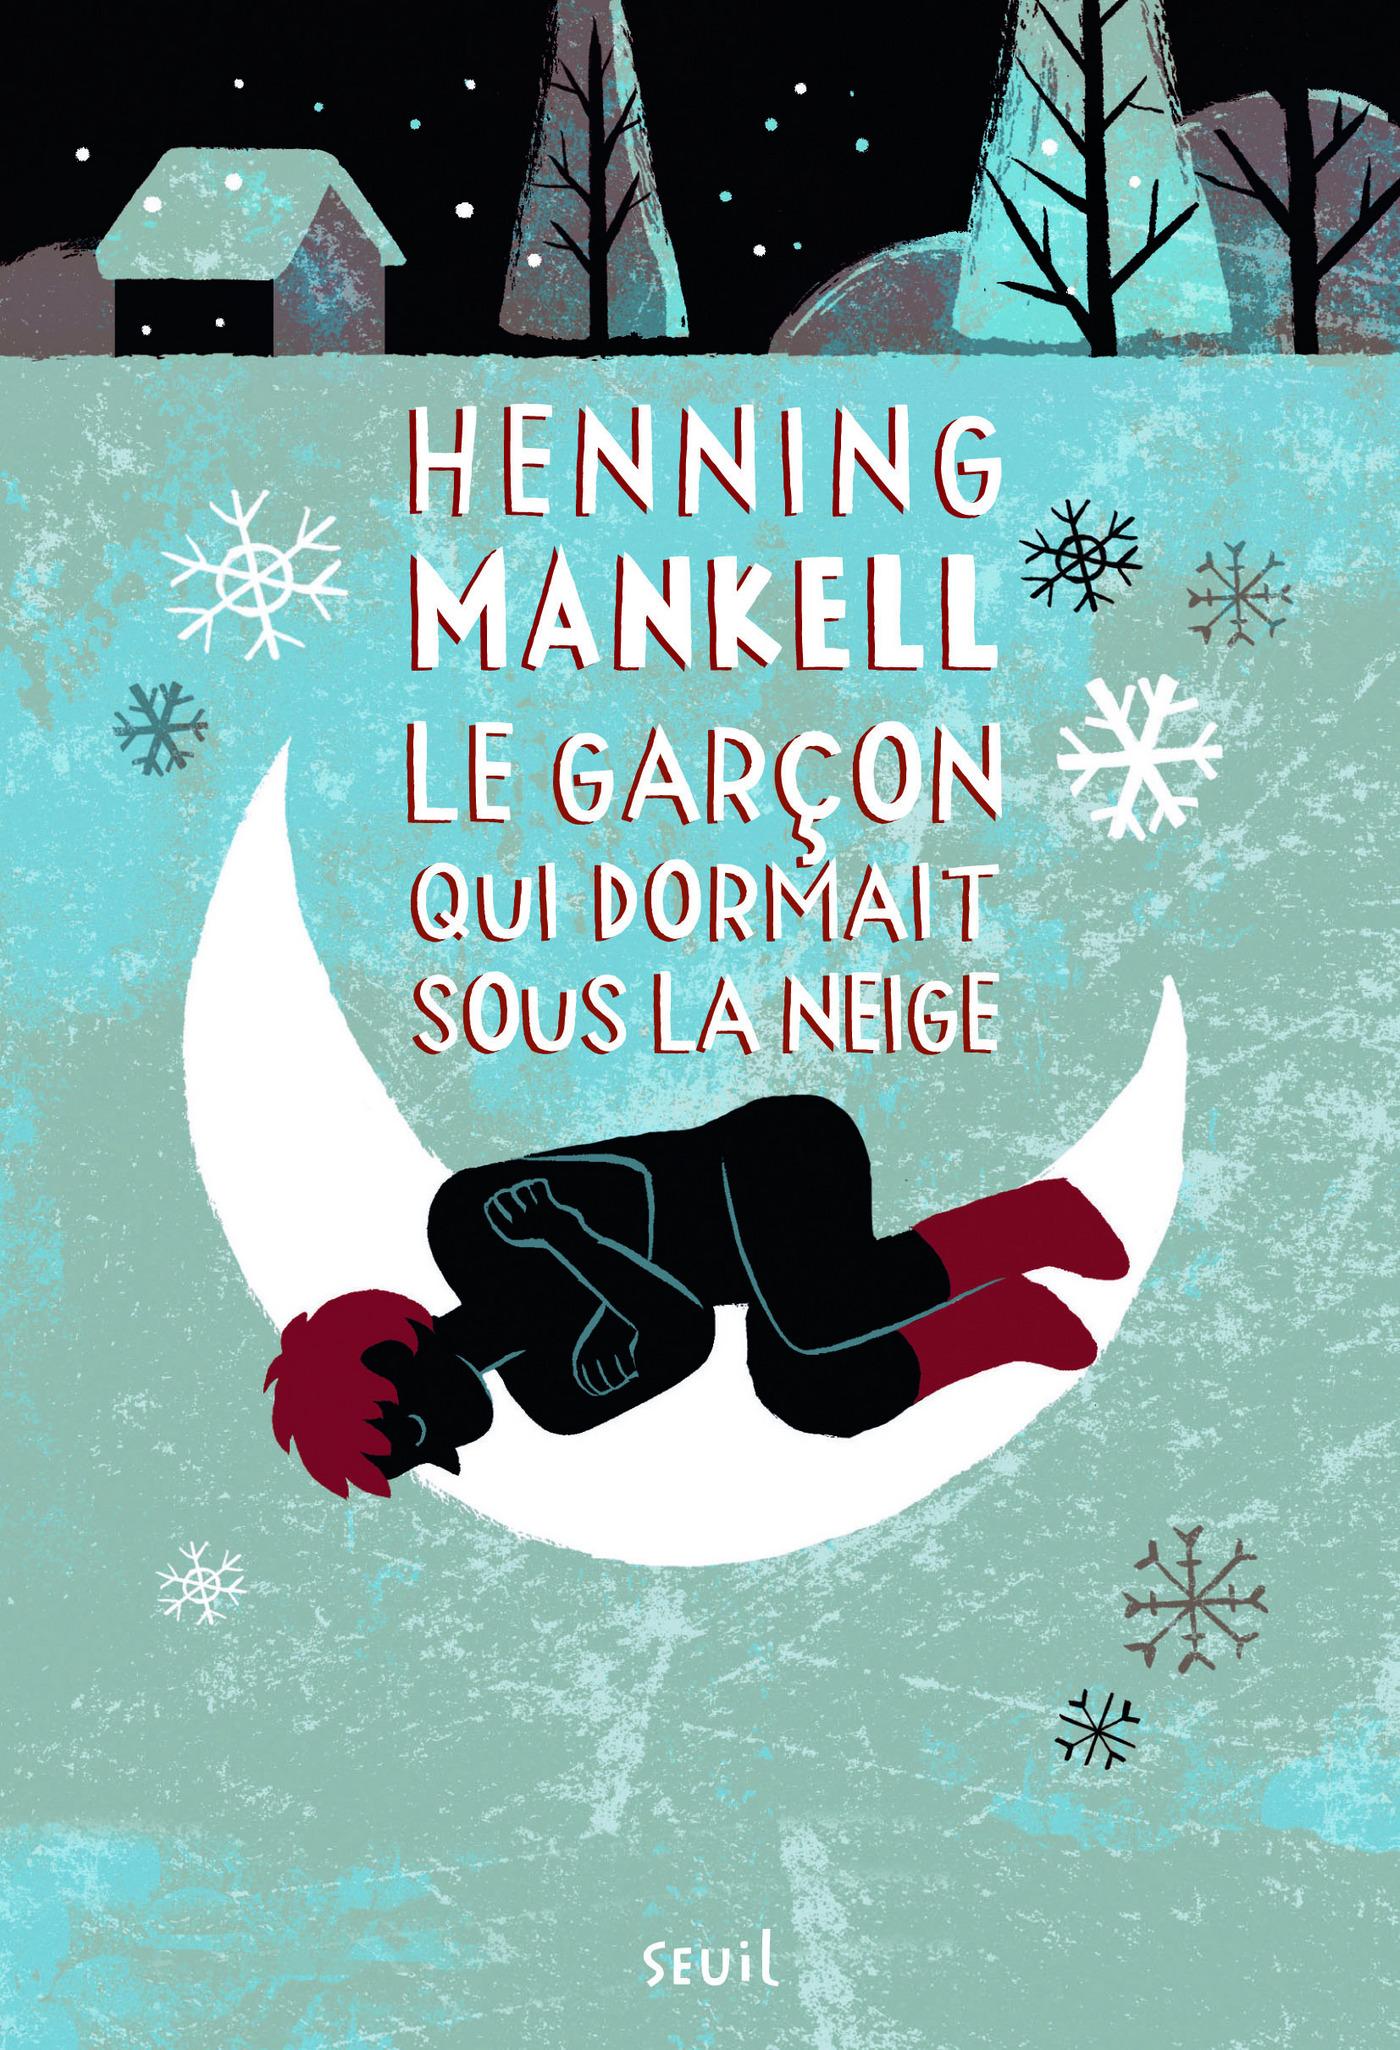 Le Garçon qui dormait sous la neige. Joel Gustafsson,tome 2   Mankell, Henning